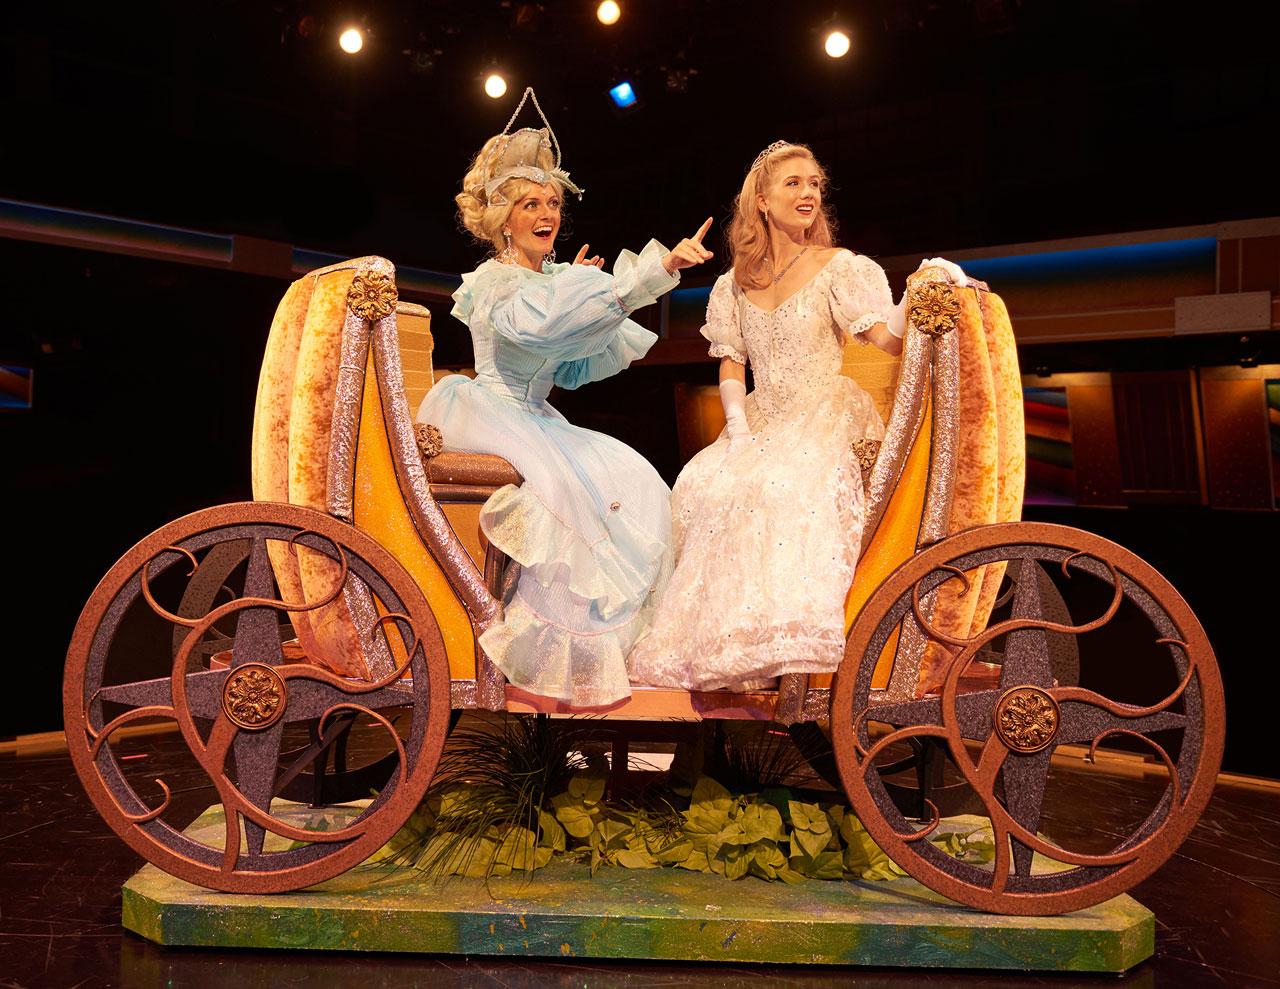 Cinderella's golden carriage